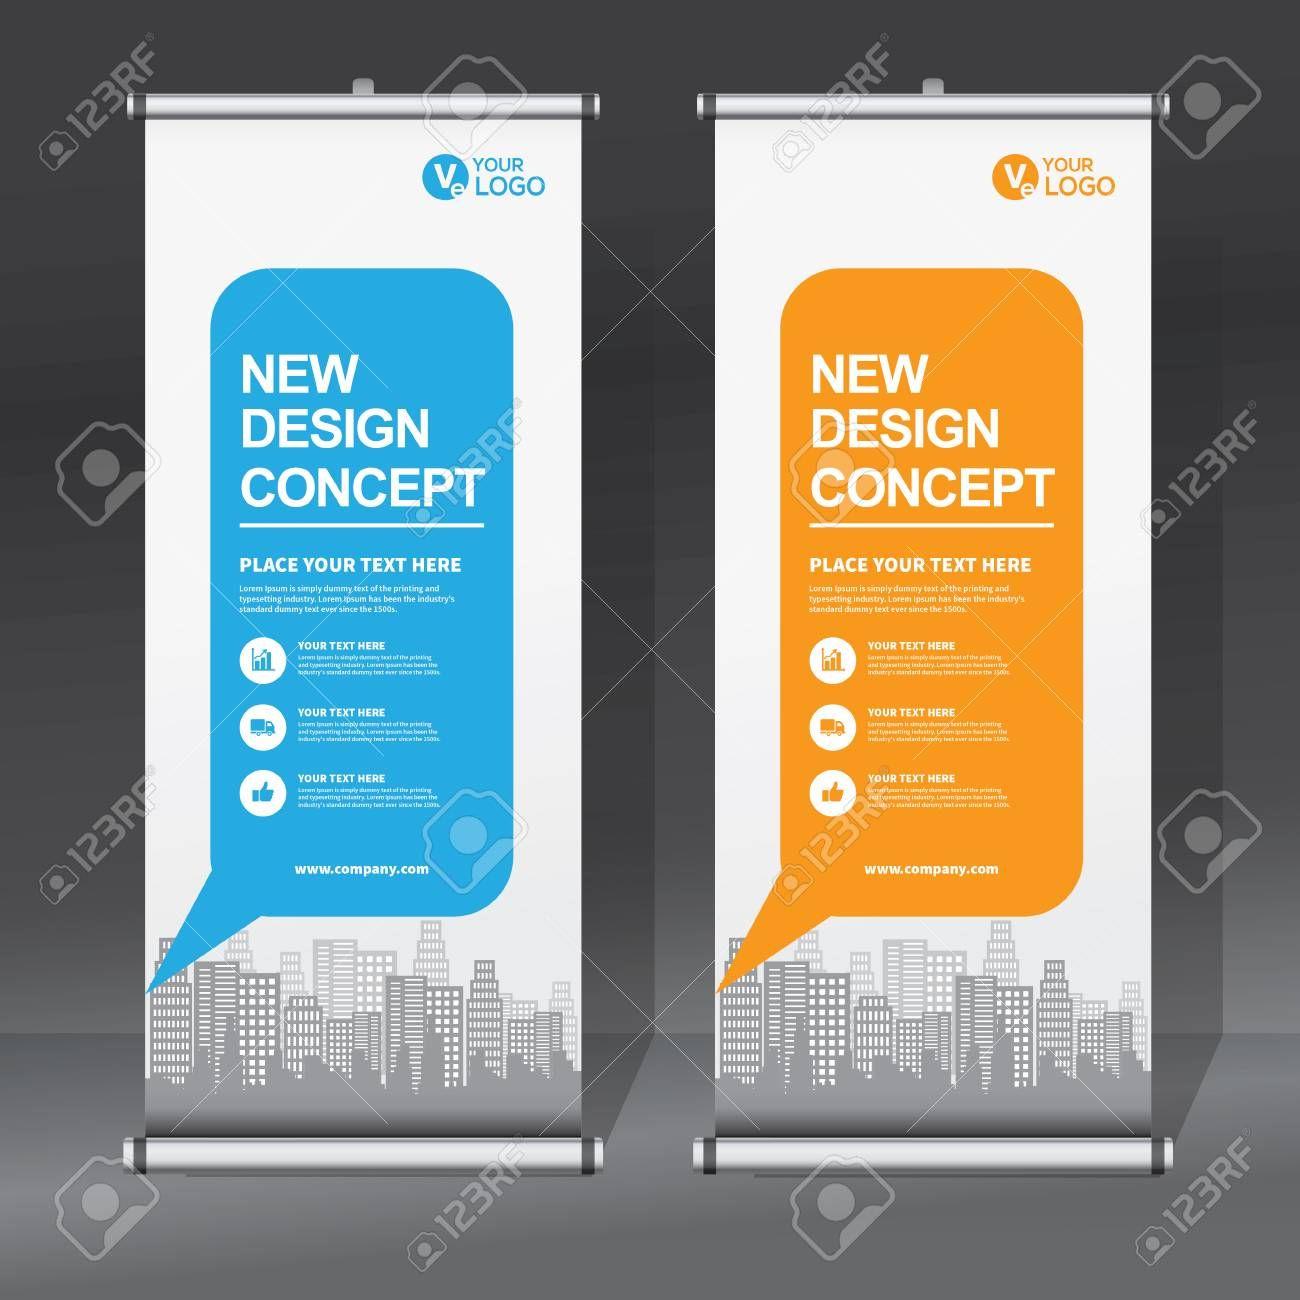 Roll Up Banner Design Template Vertical Abstract Background Pull Up Design Modern X Banner Rectangle Si Pull Up Banner Design Banner Design Concept Design